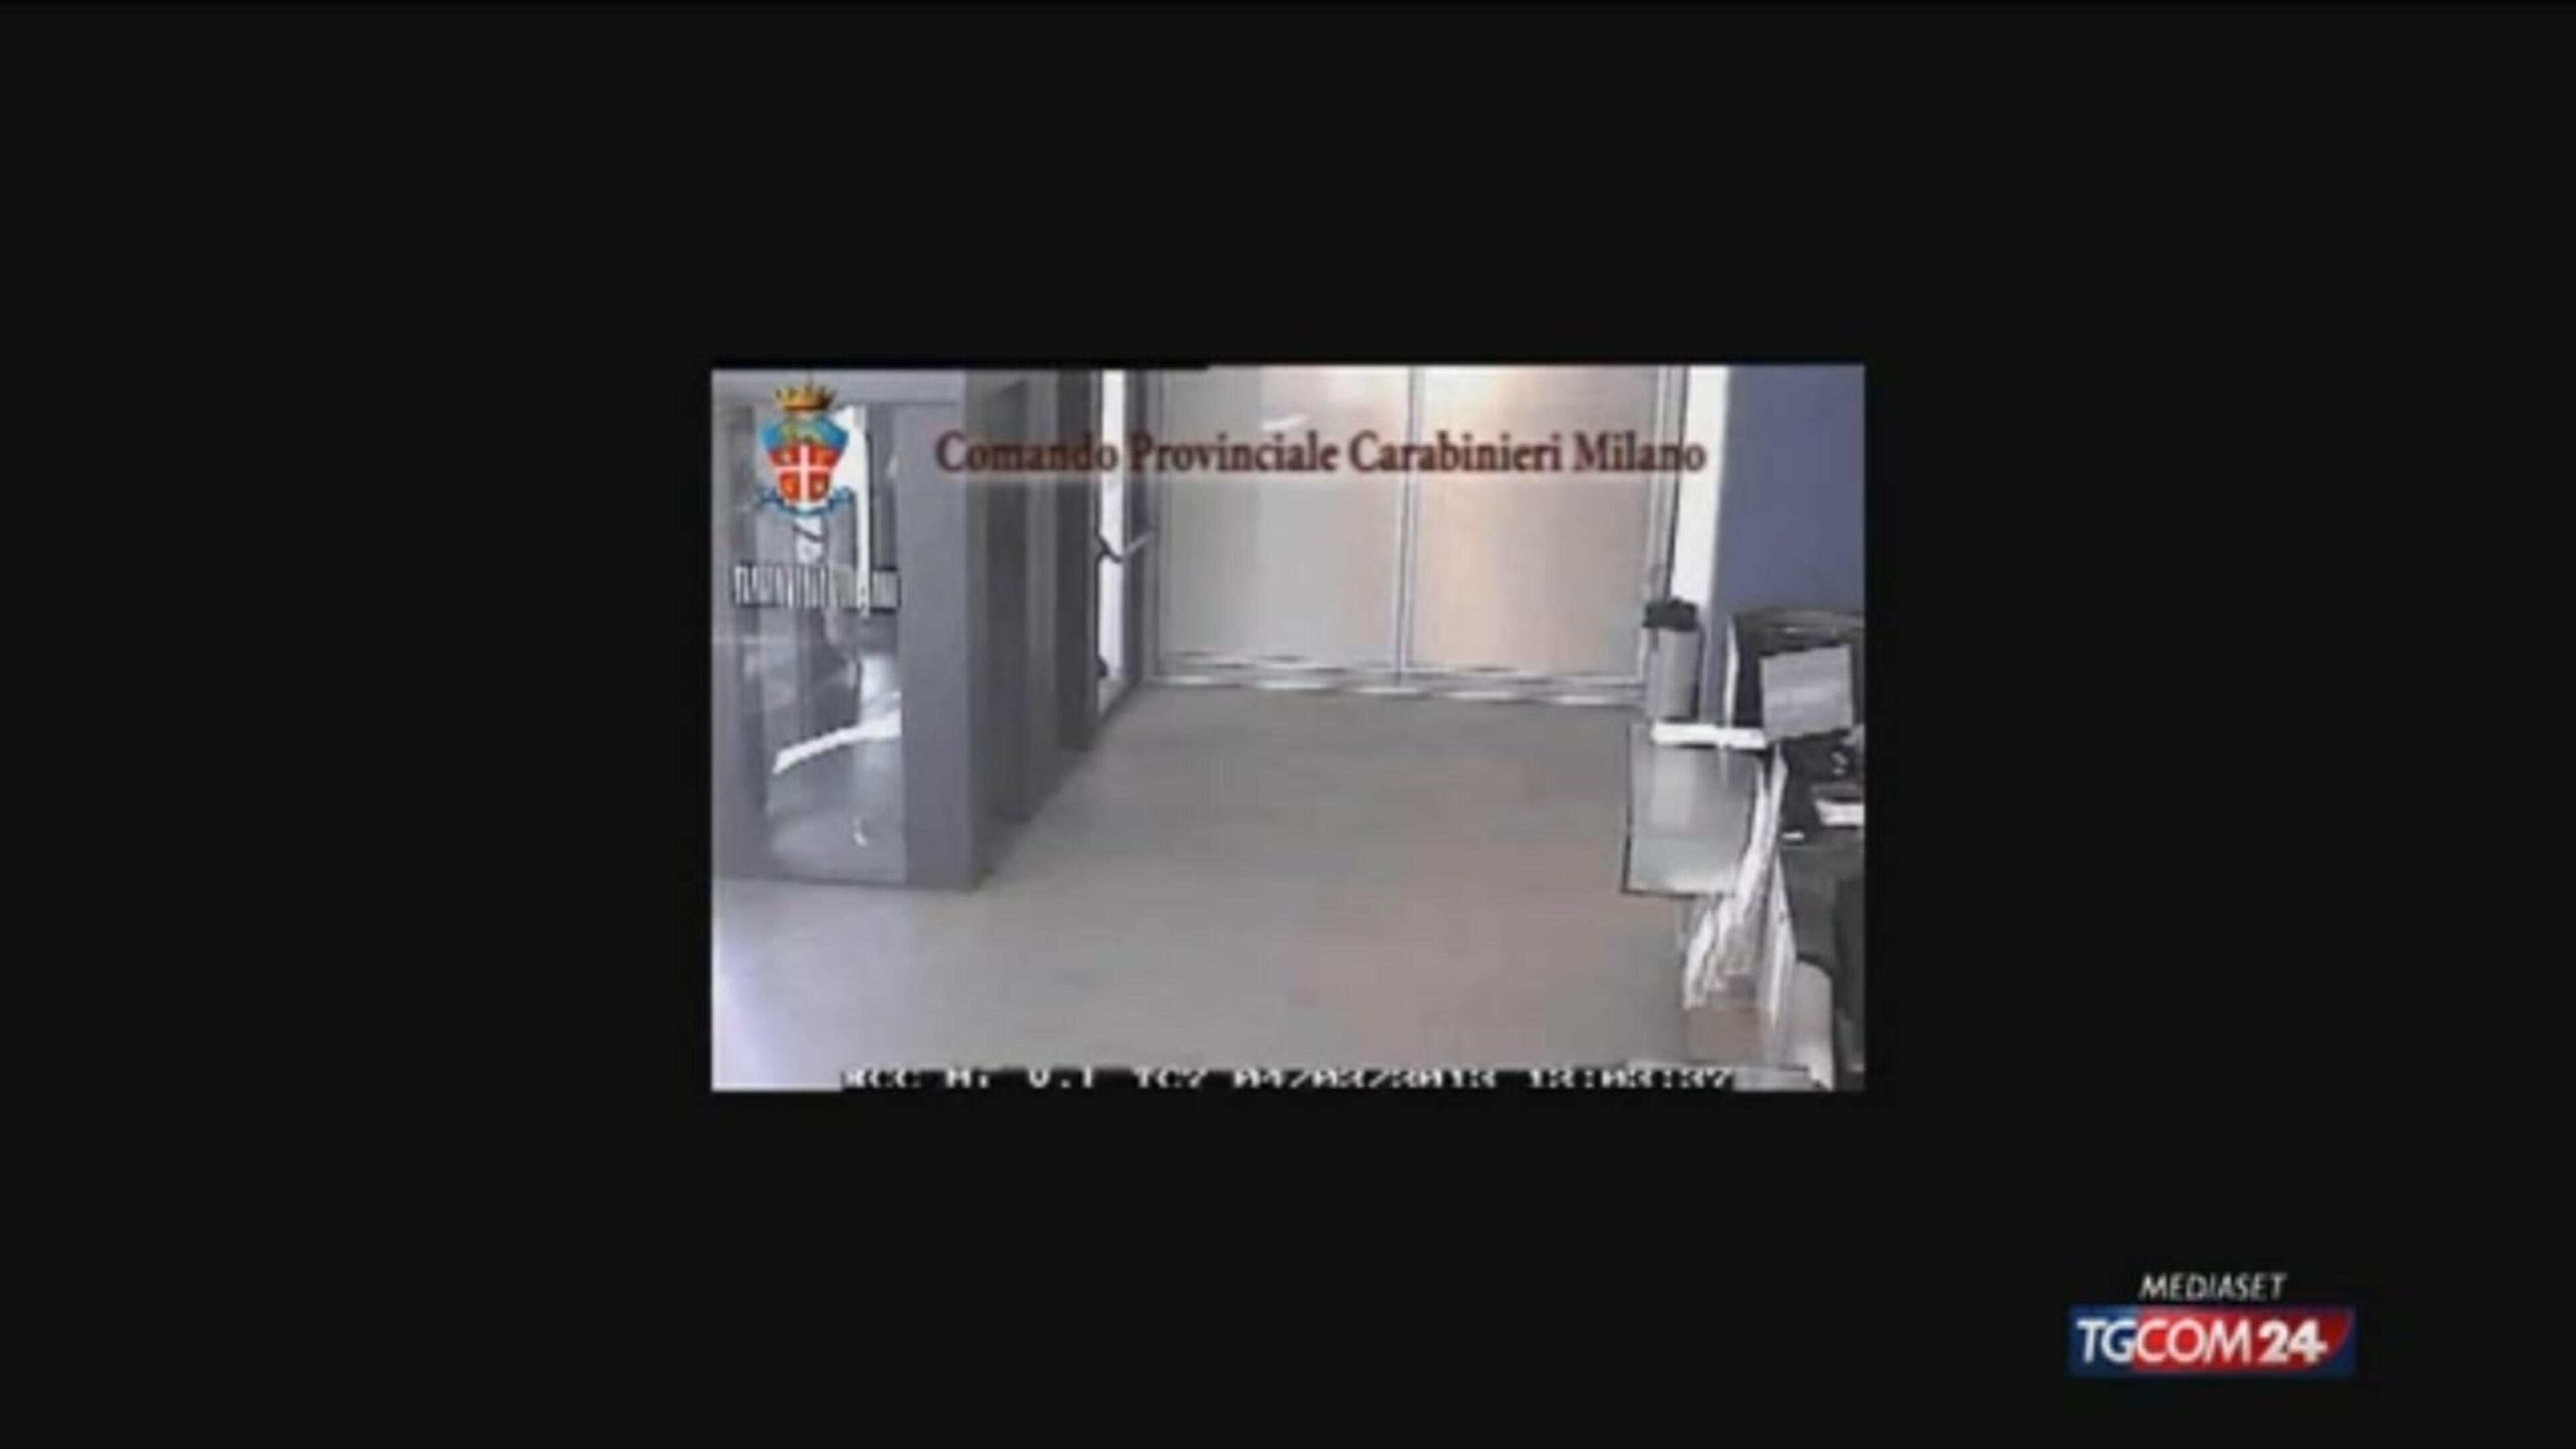 Video tgcom24 rapina in banca a milano ultimi arrivi for Aste giudiziarie milano ultimi arrivi